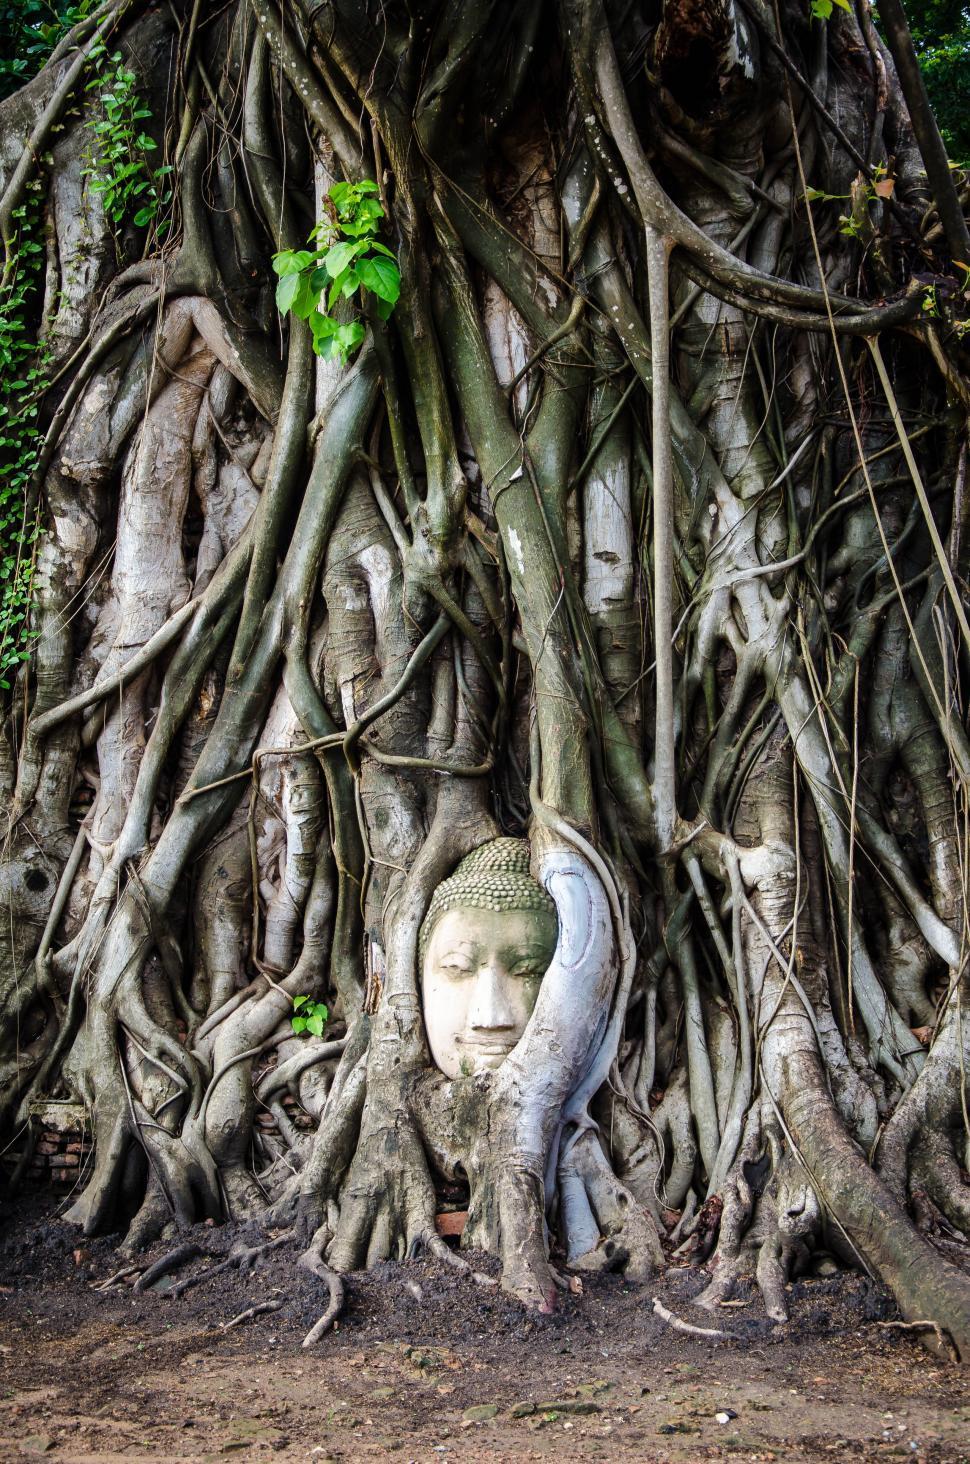 Download Free Stock Photo of Overgrown Buddha Statue